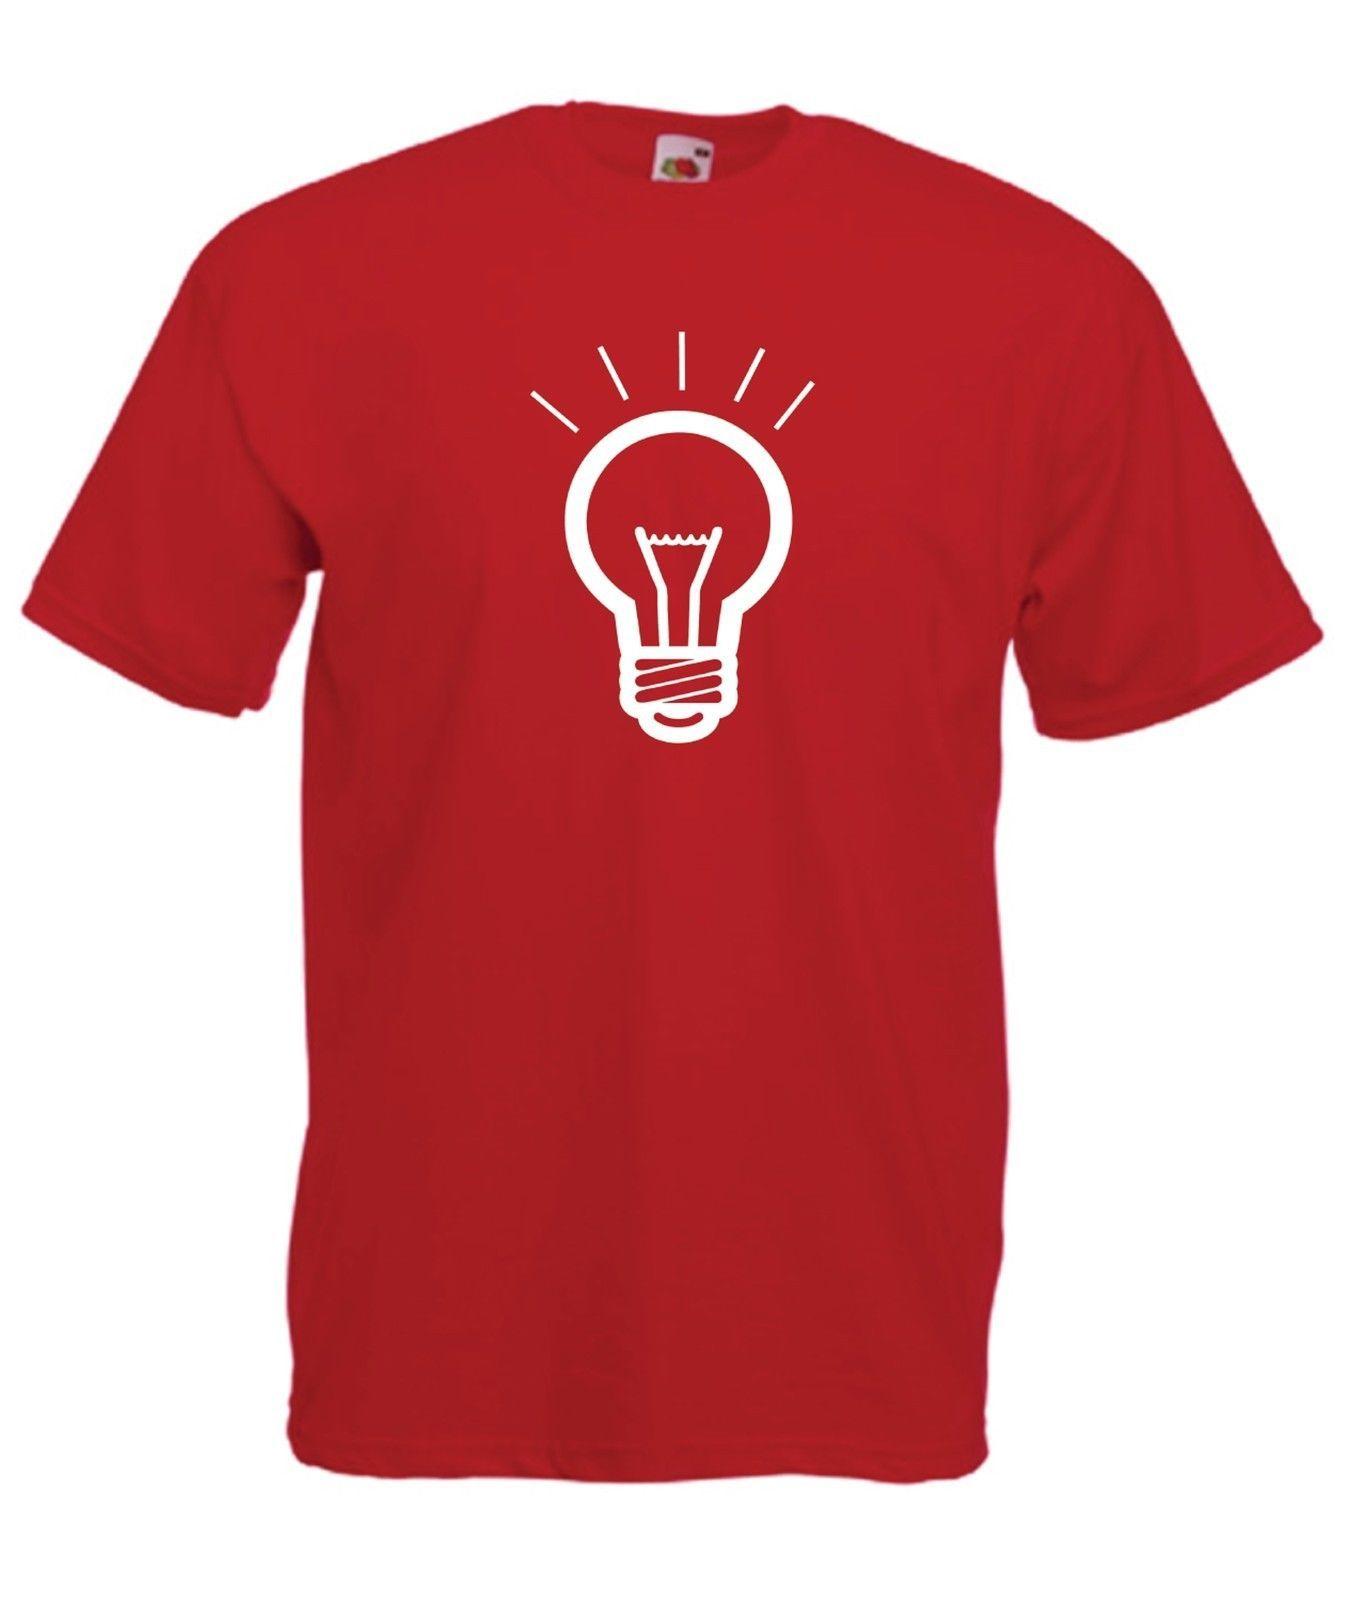 FUNNY LIGHT BULB Tee Present NEW Xmas Birthday Gift Ideas Boys Girls Top T SHIRT Tees Custom Jersey Shirt Dress Cheap Shirts From Mooncup